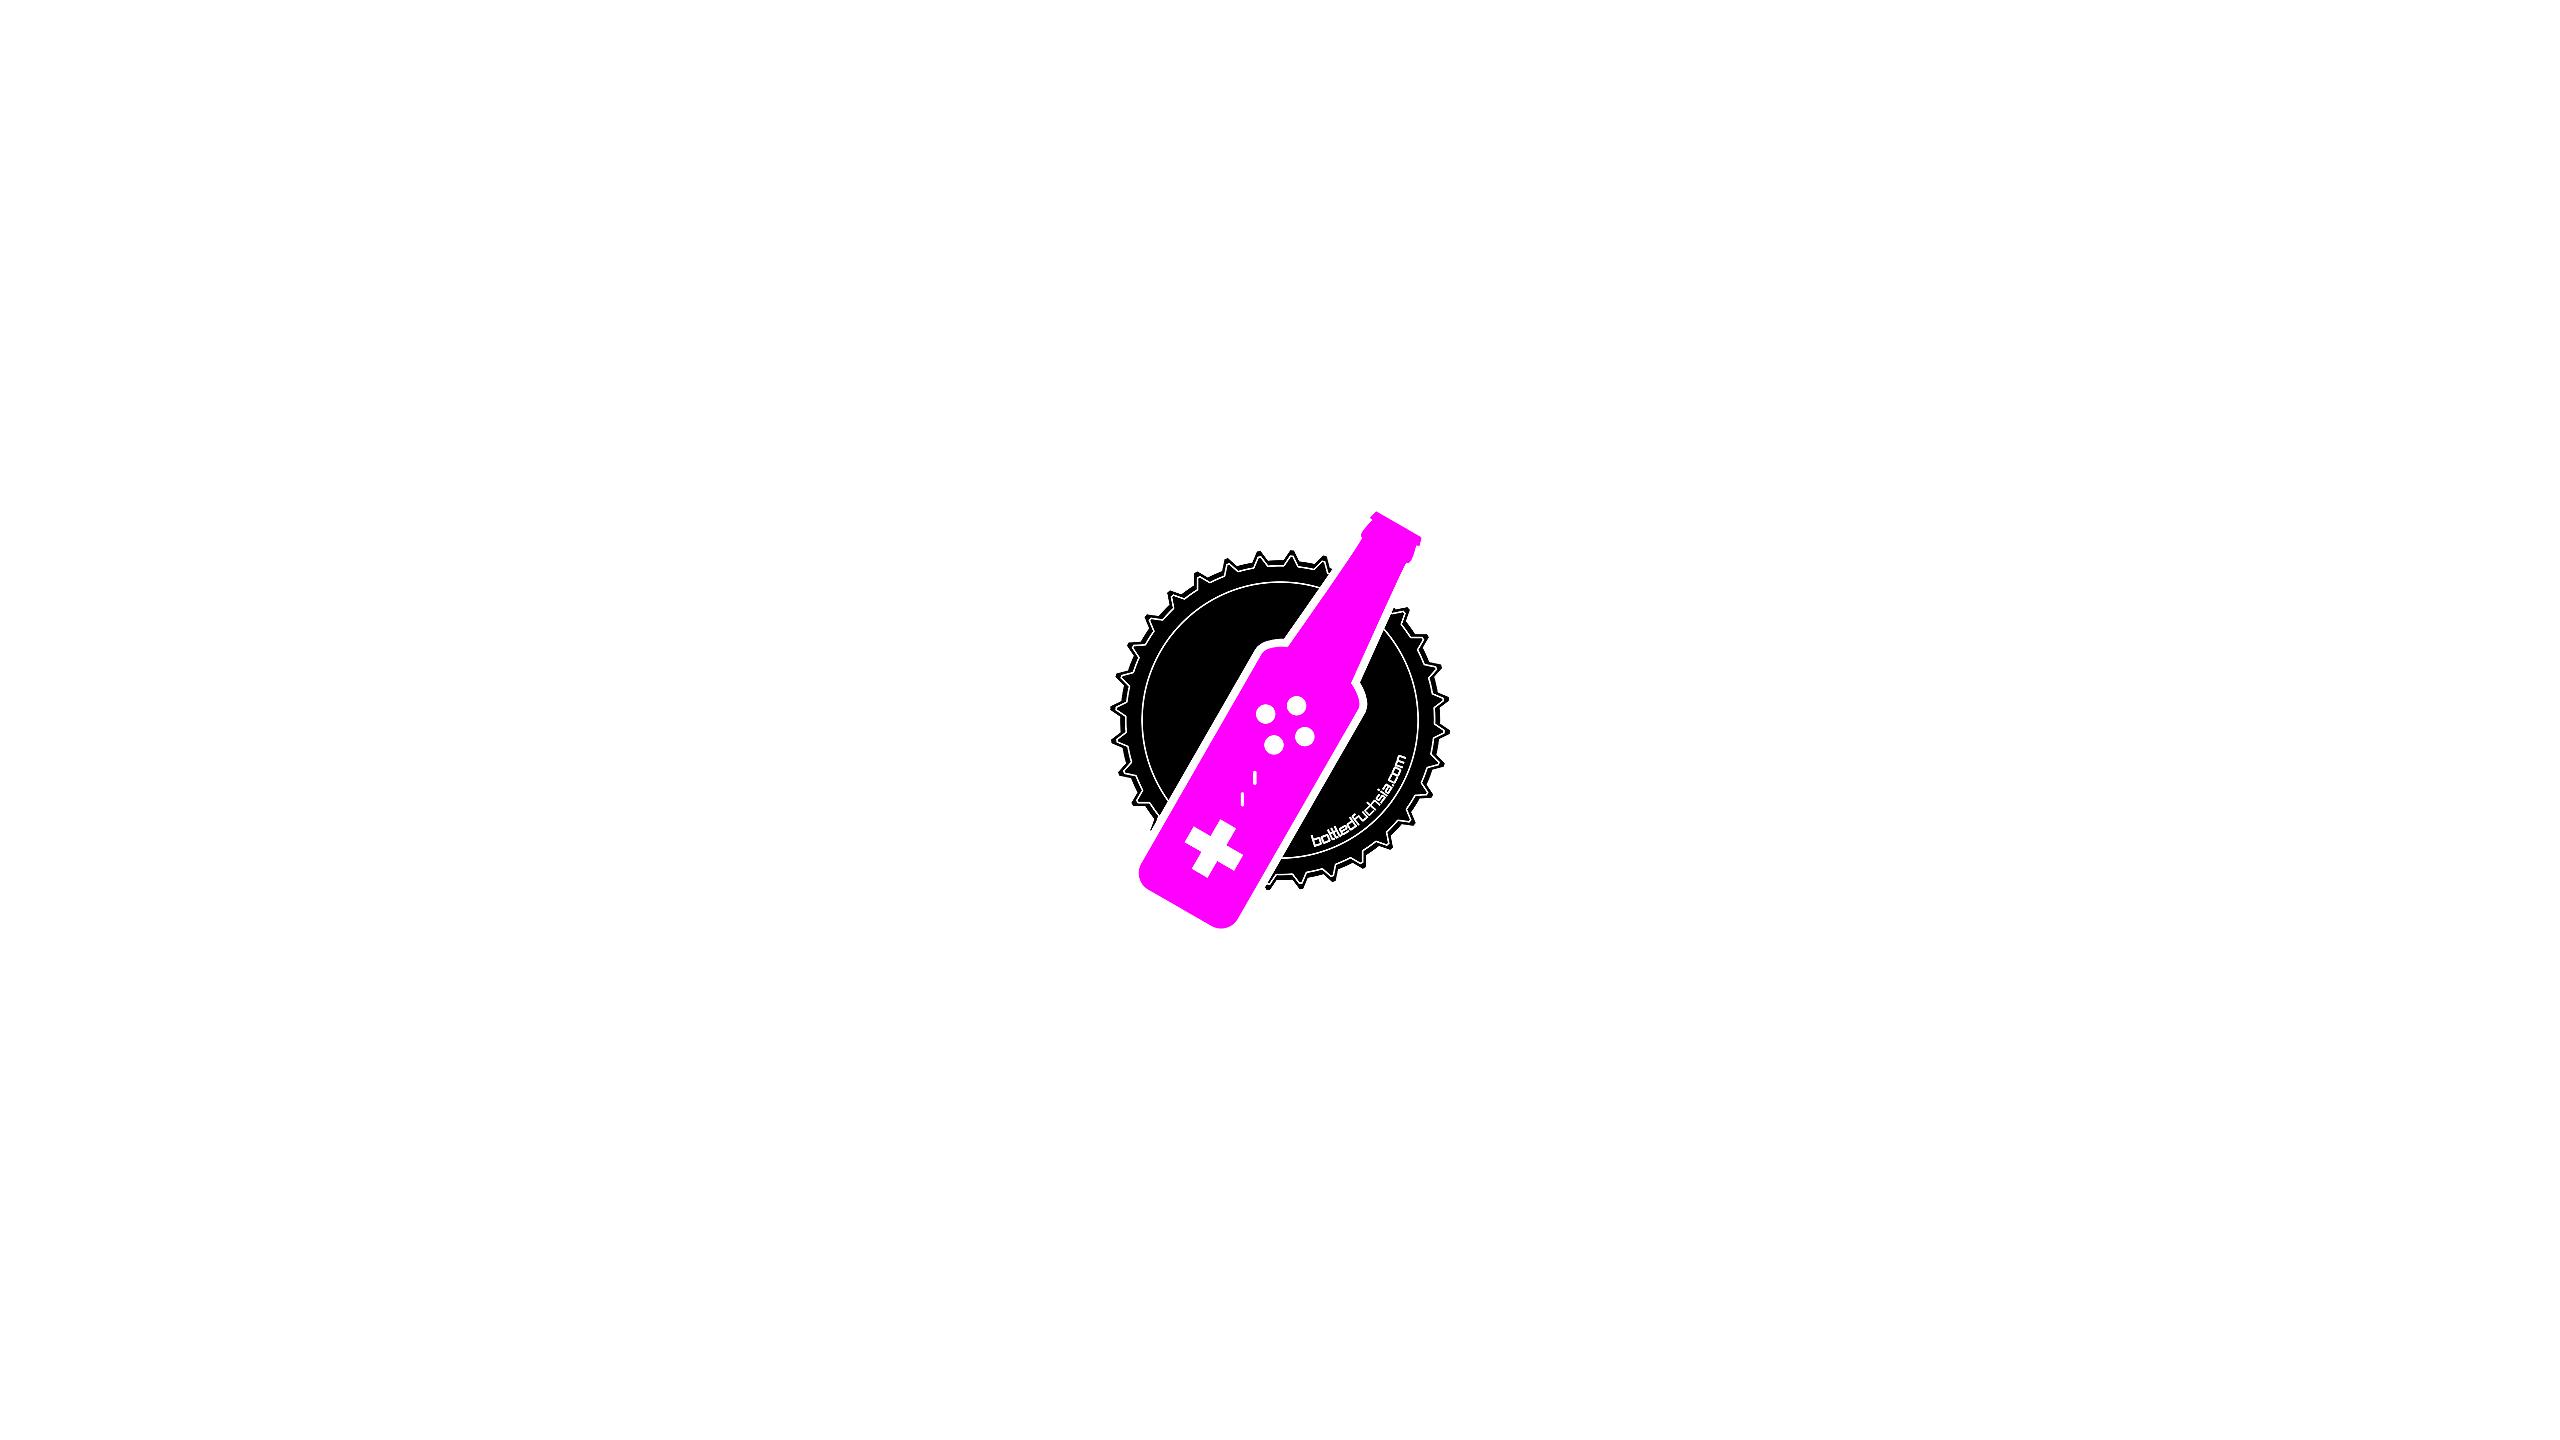 logo_2560x1440